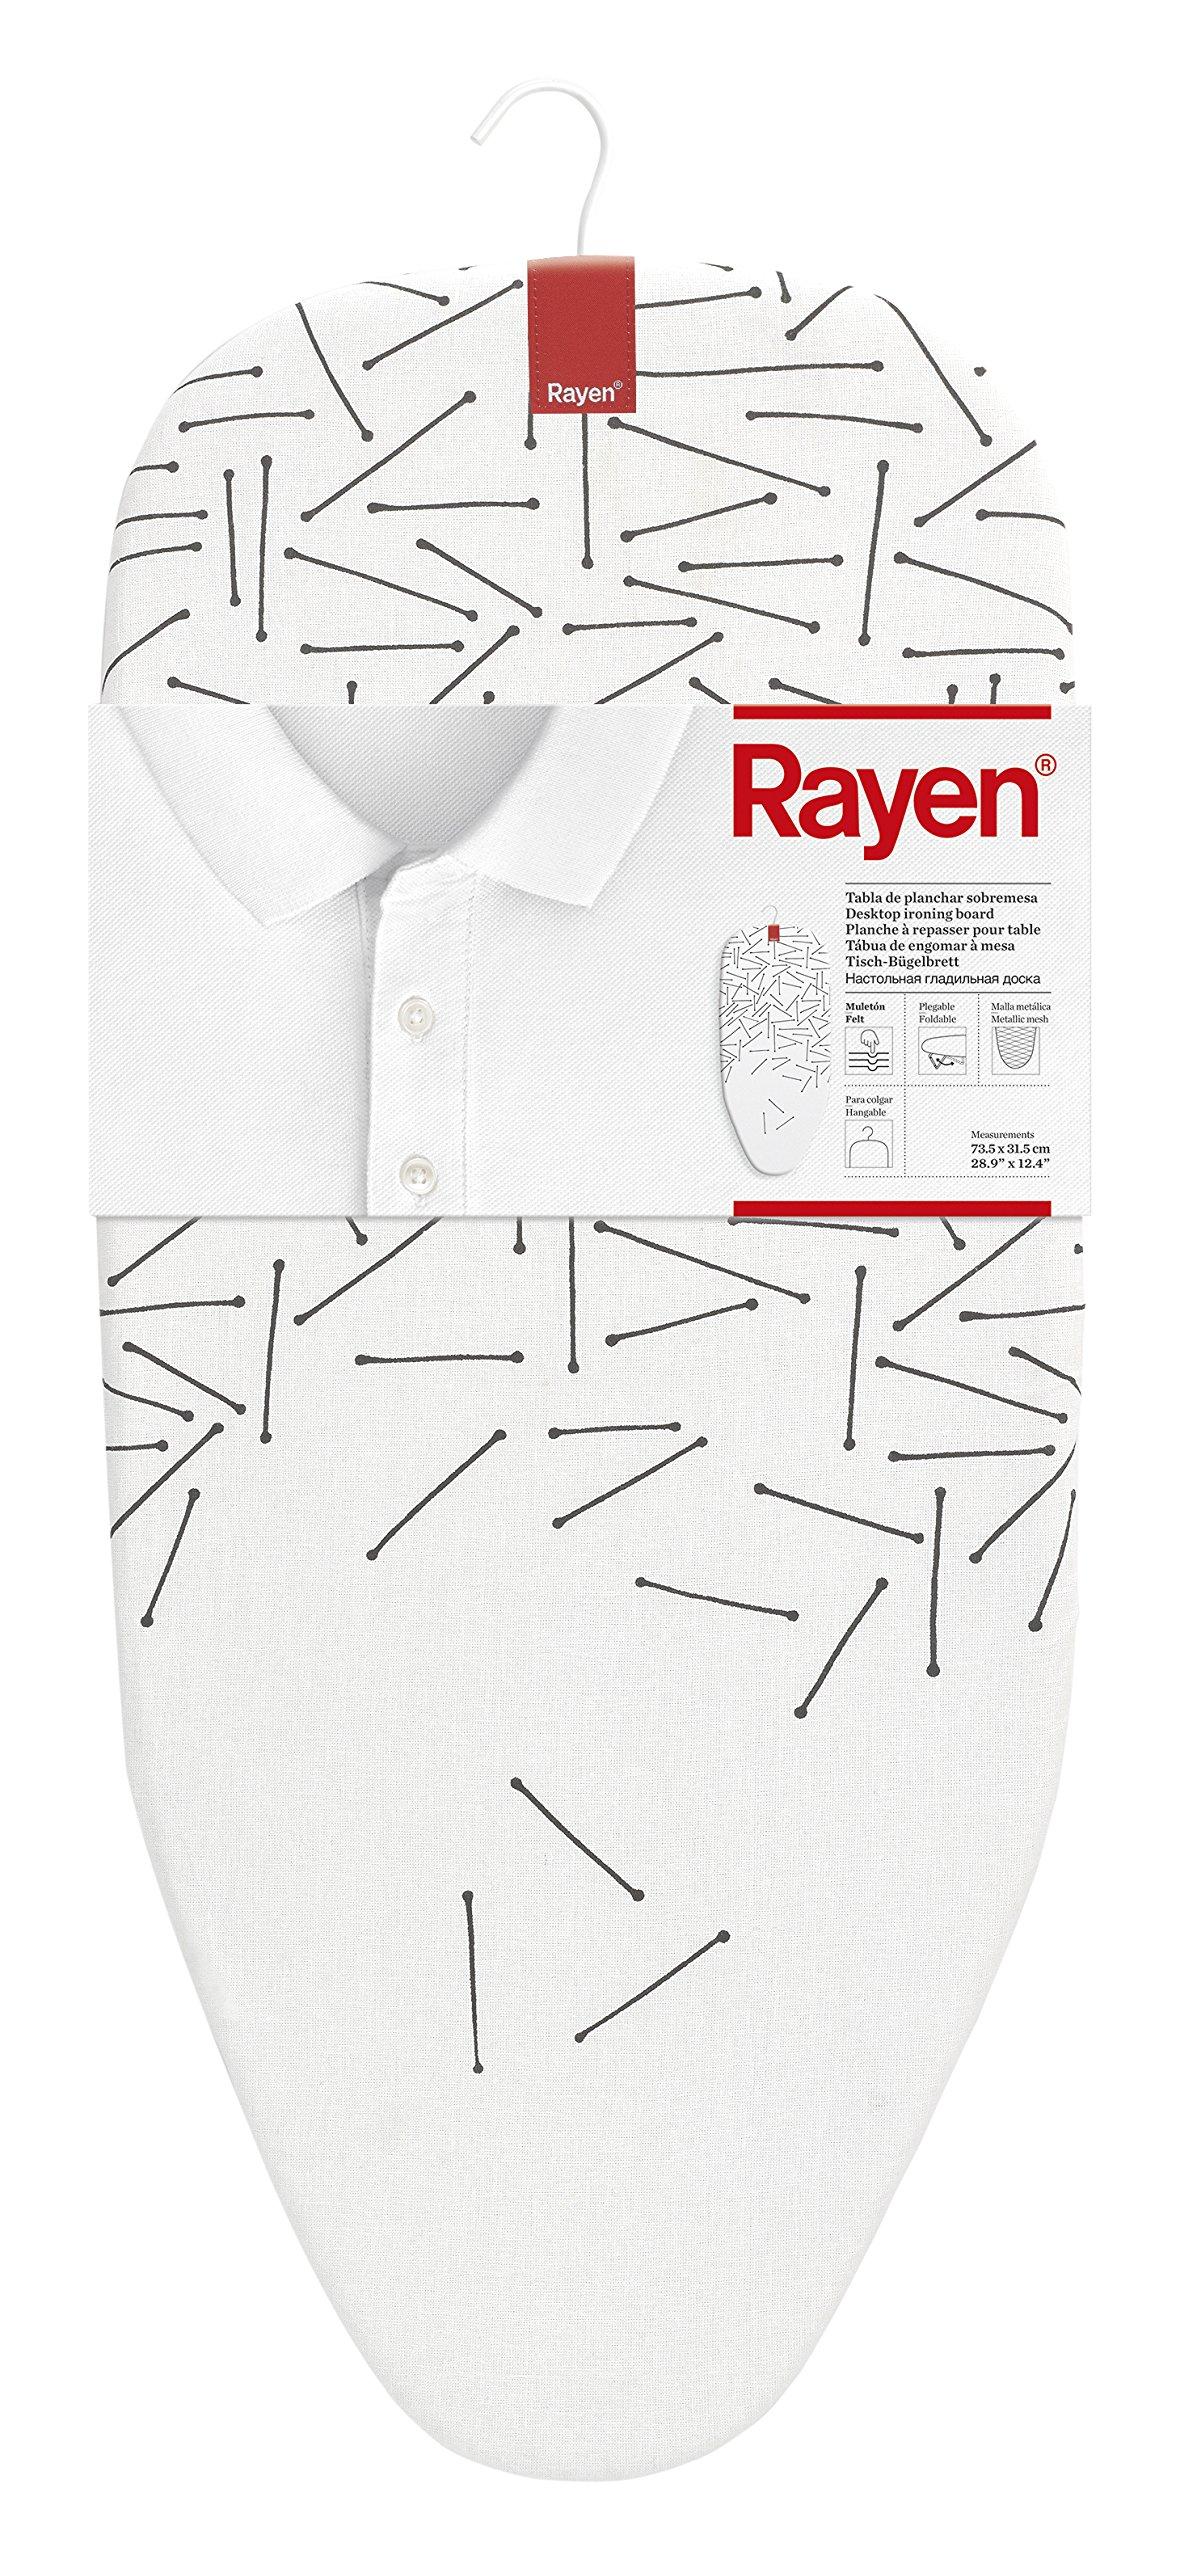 Rayen Tabla de Planchar sobremesa, Metal, Estampado, 1.7x32x73 cm